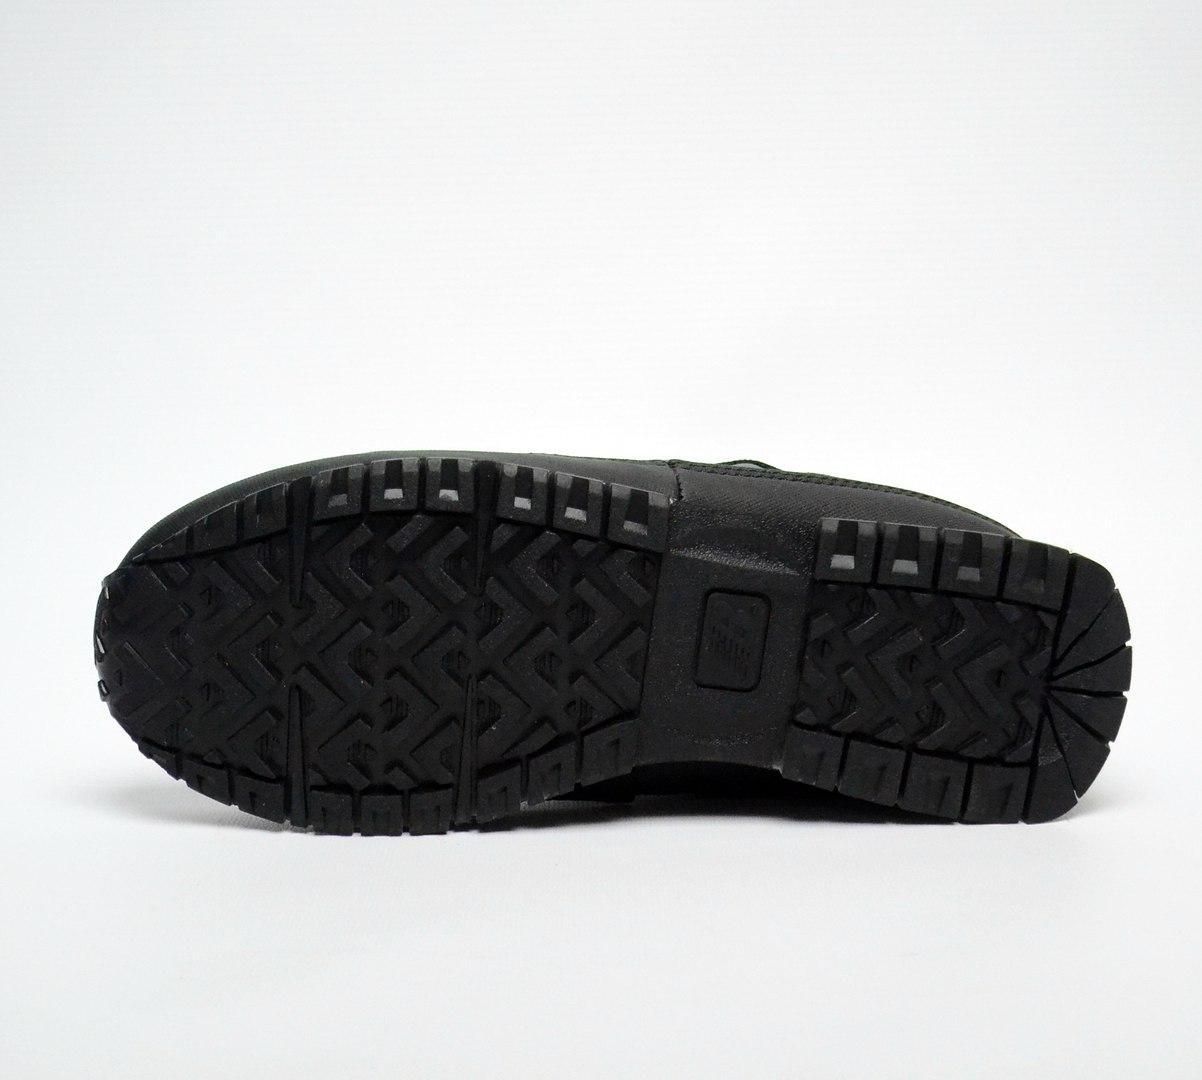 Мужские ботинки New Balance 754 HL754BB Winter Shoes Black Blue ... bd1f488a038e4